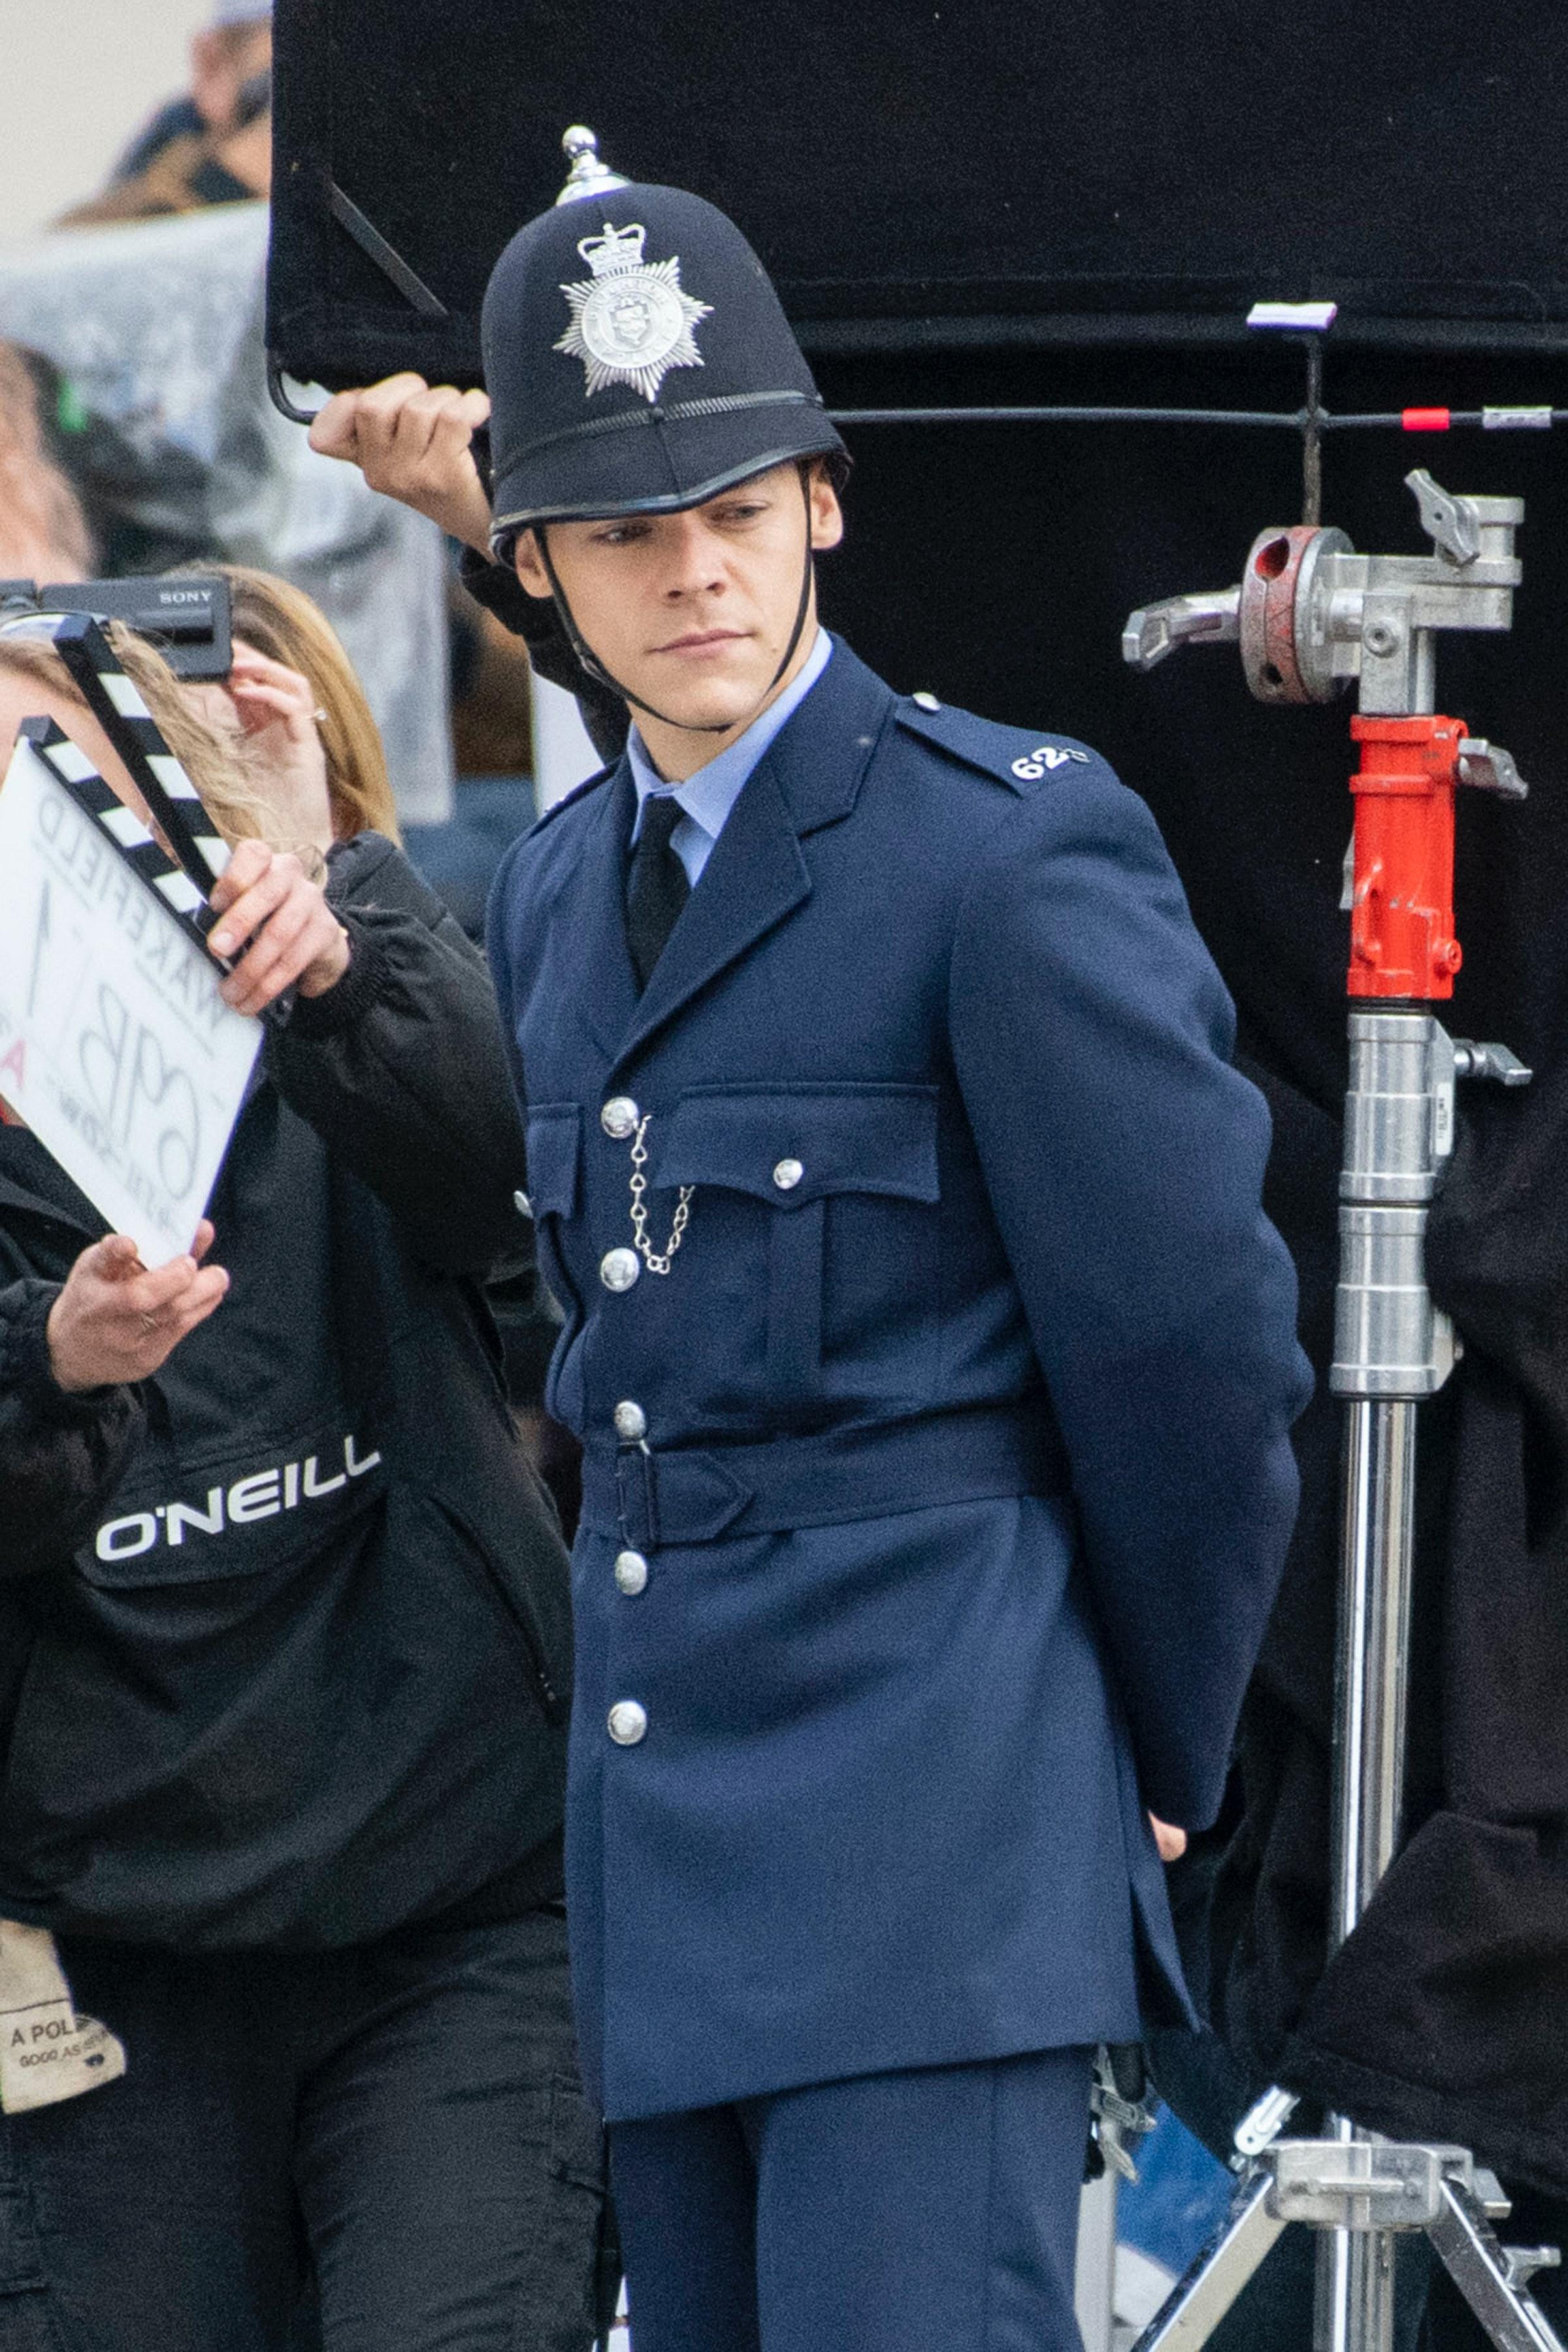 'My Policeman': Release Date, Cast, Trailer, Plot, & More Info